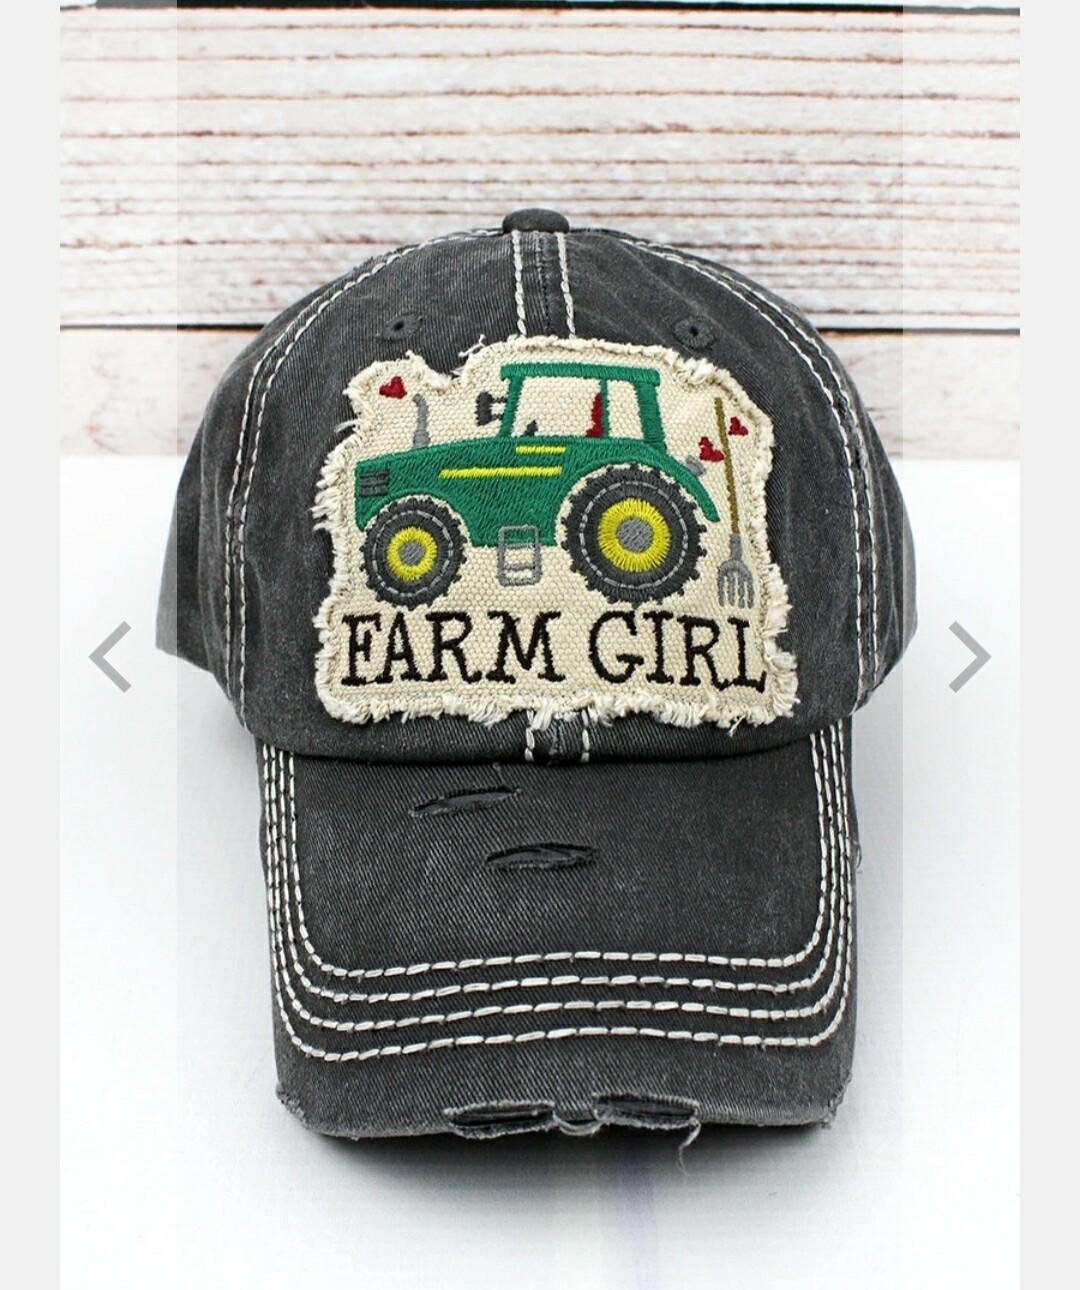 Distressed Black Farm Girl Cap